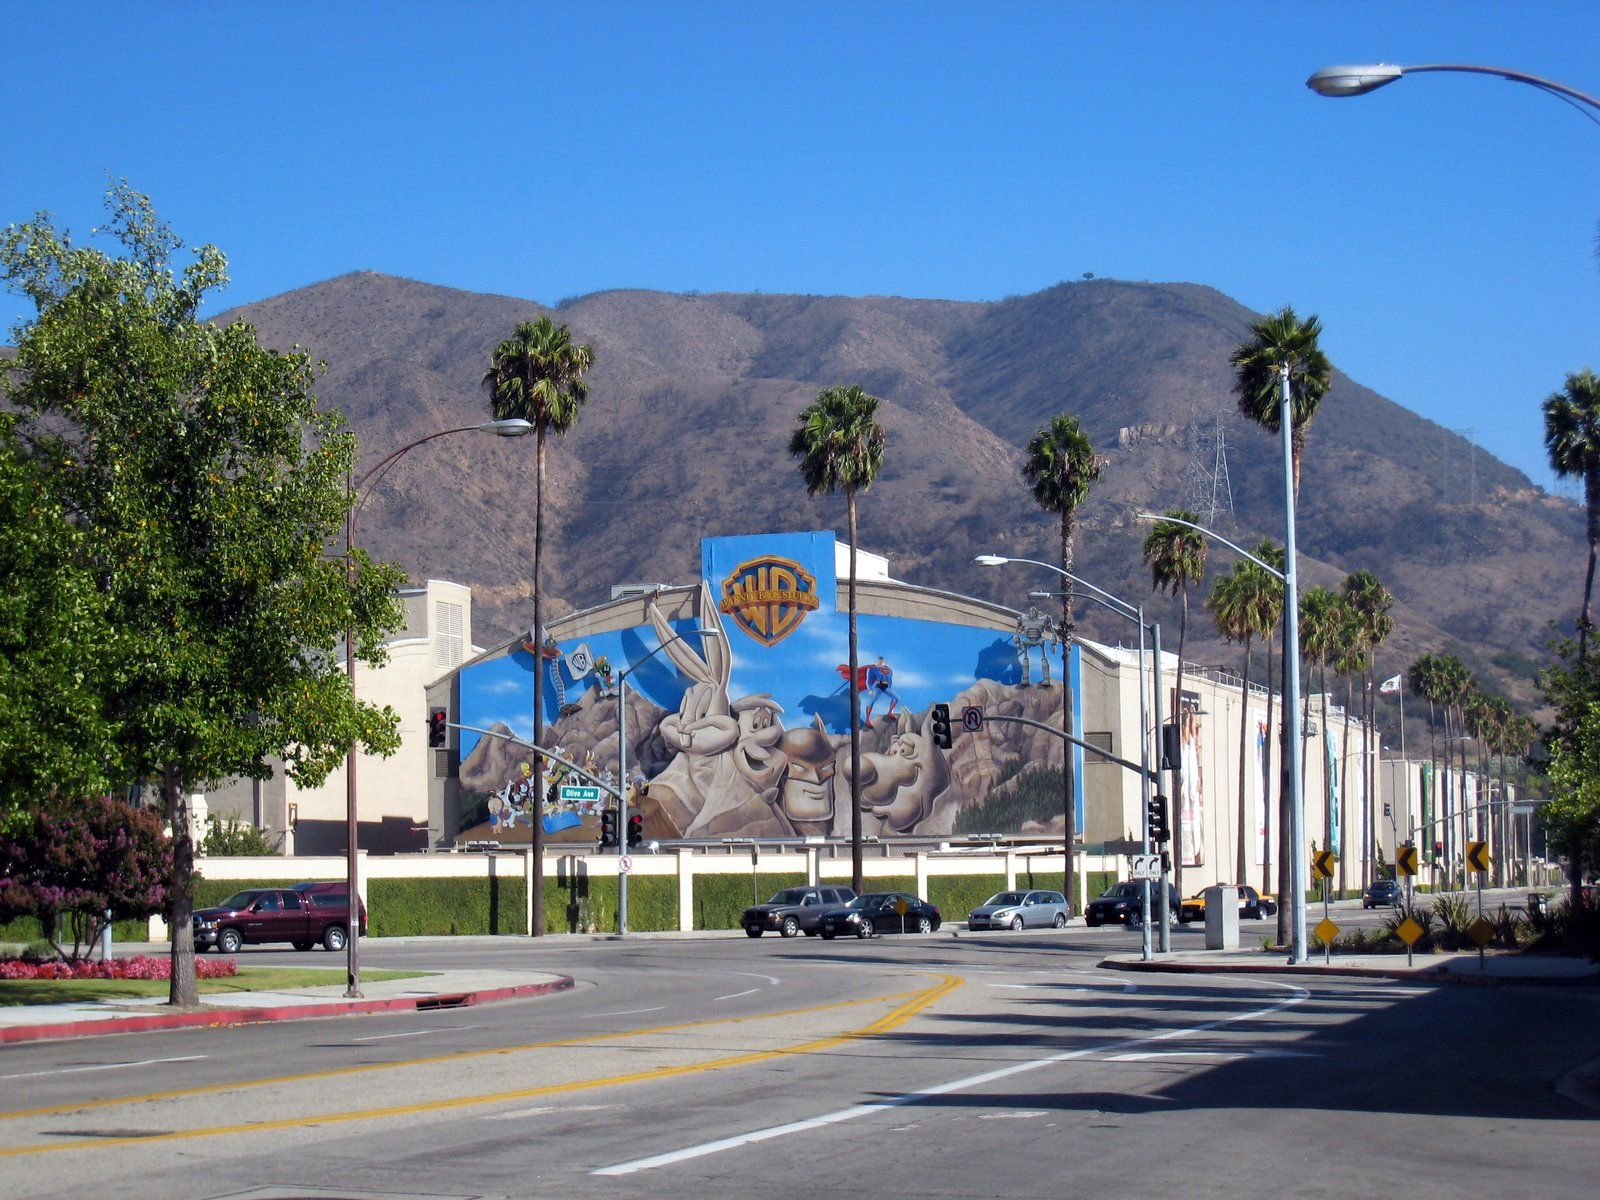 burbank california images | save on travel to burbank, california